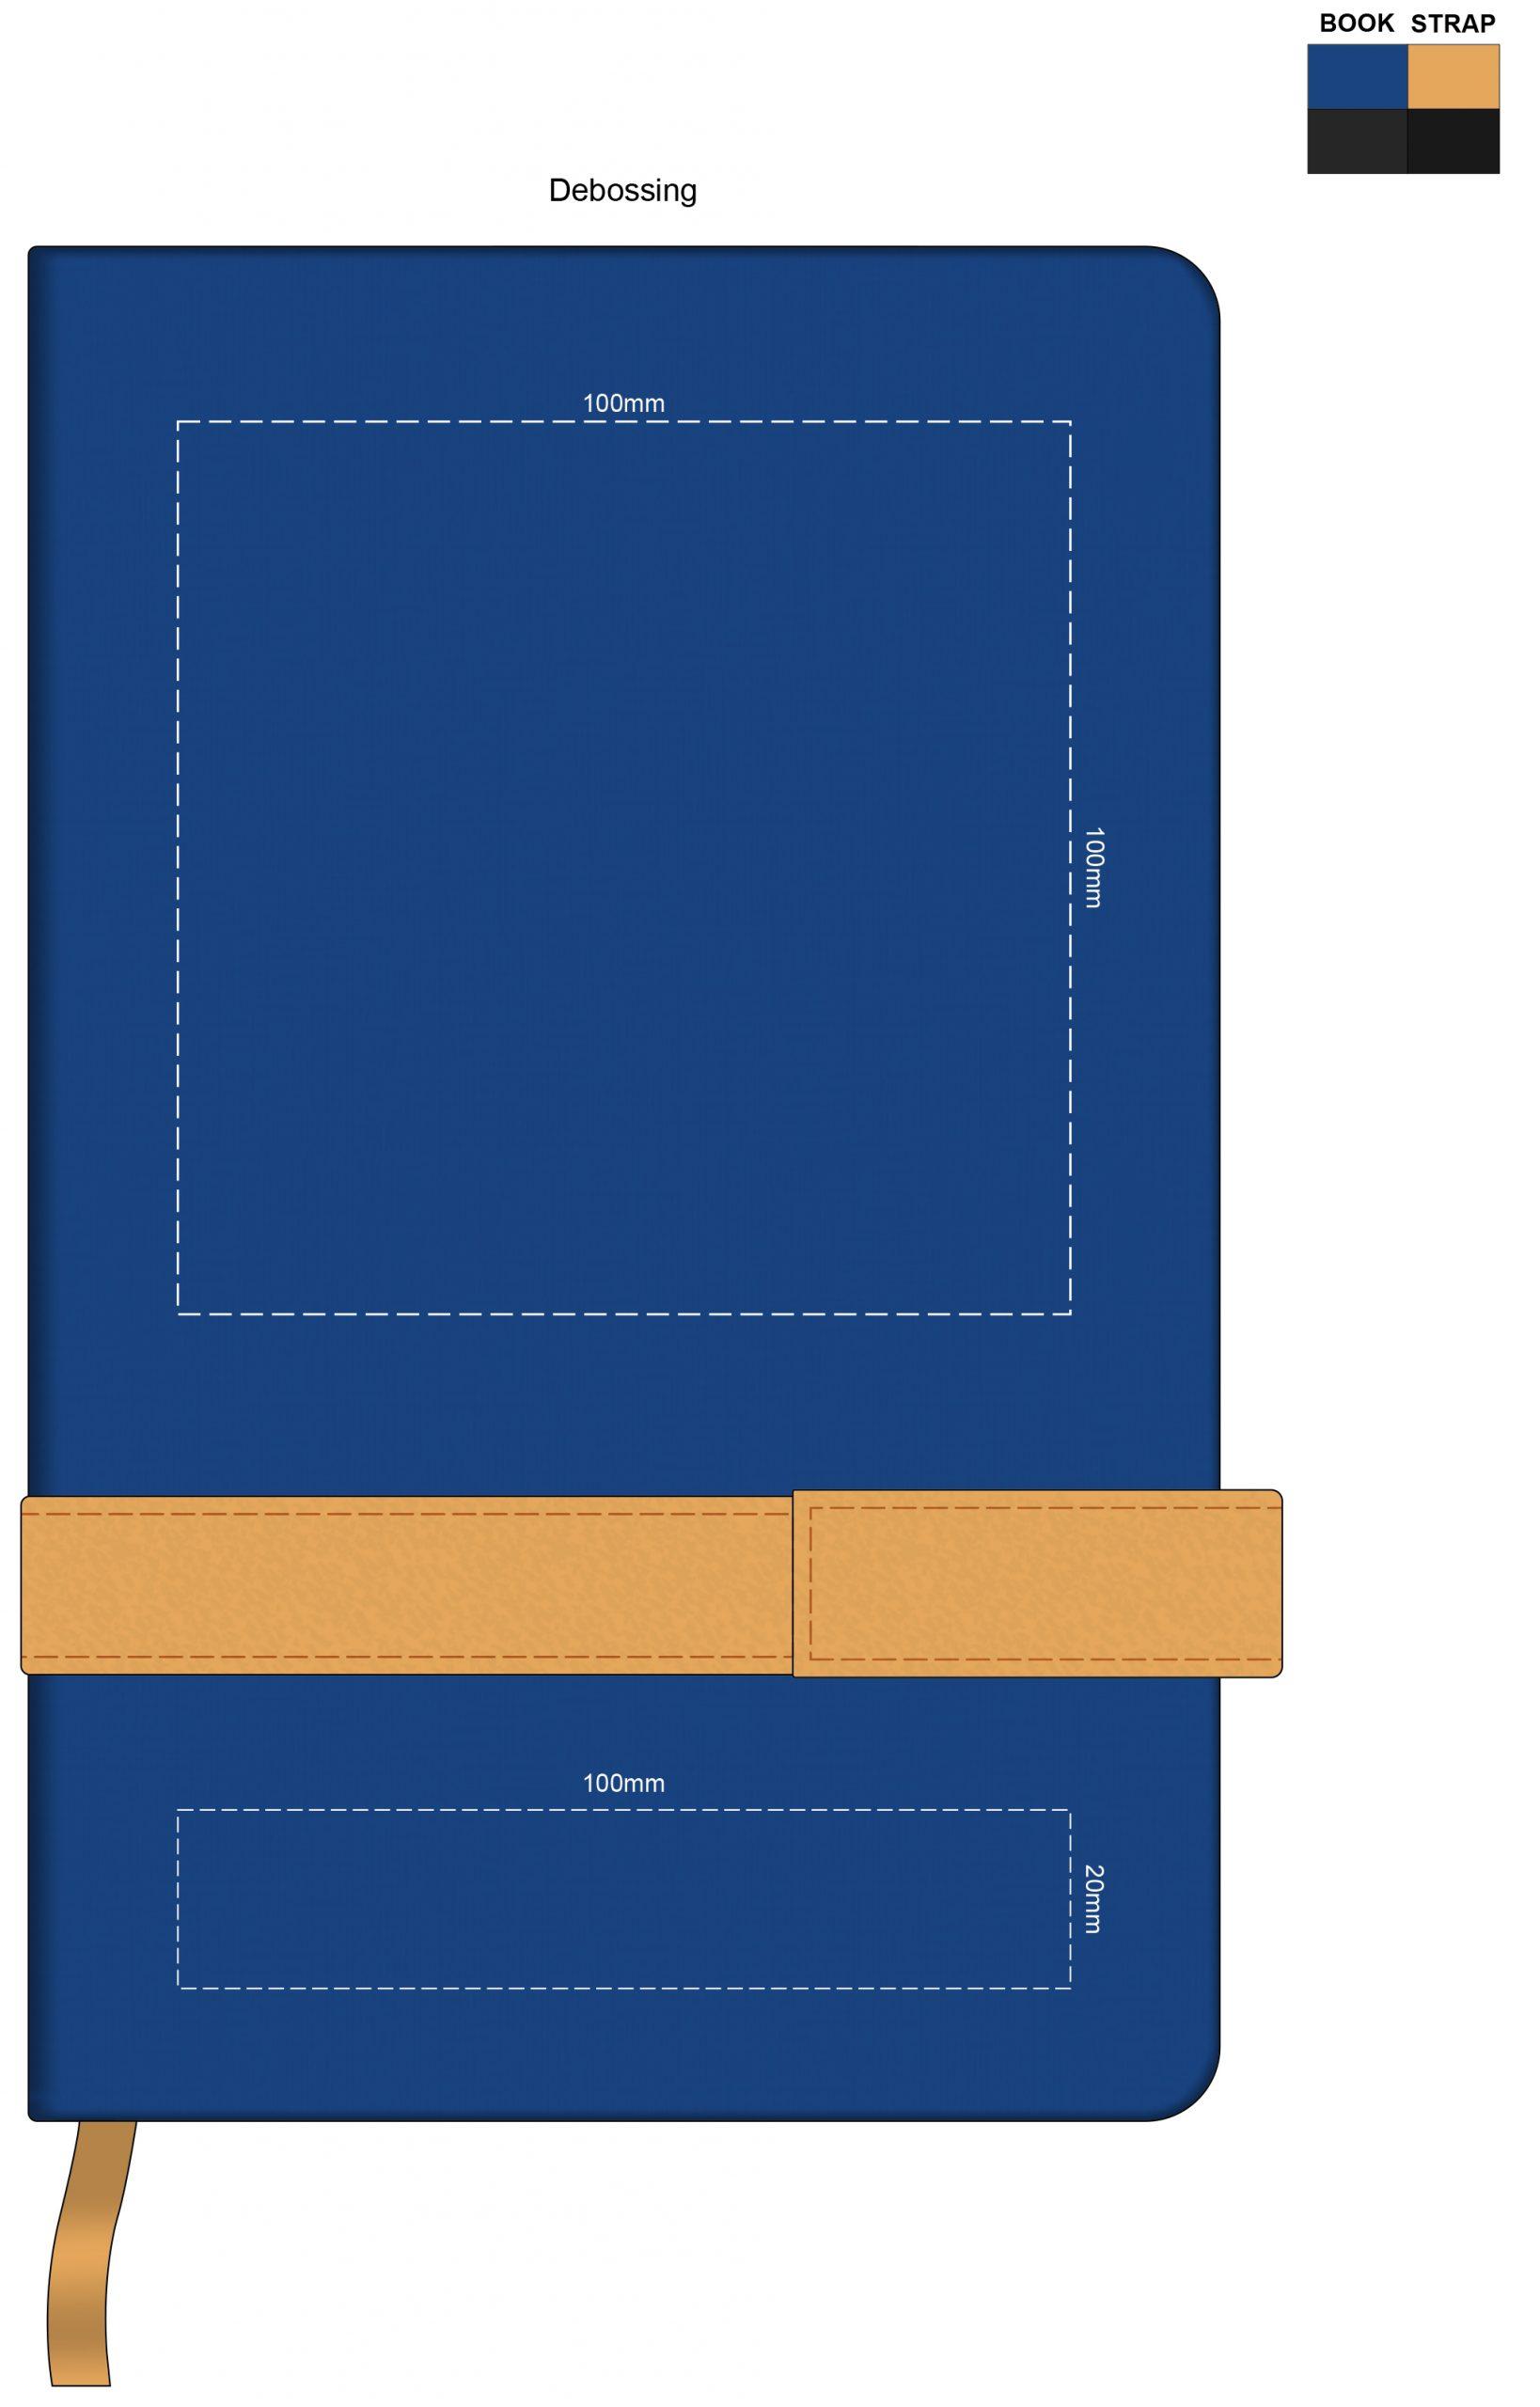 Nirvana Notebook Branding Template 2 scaled